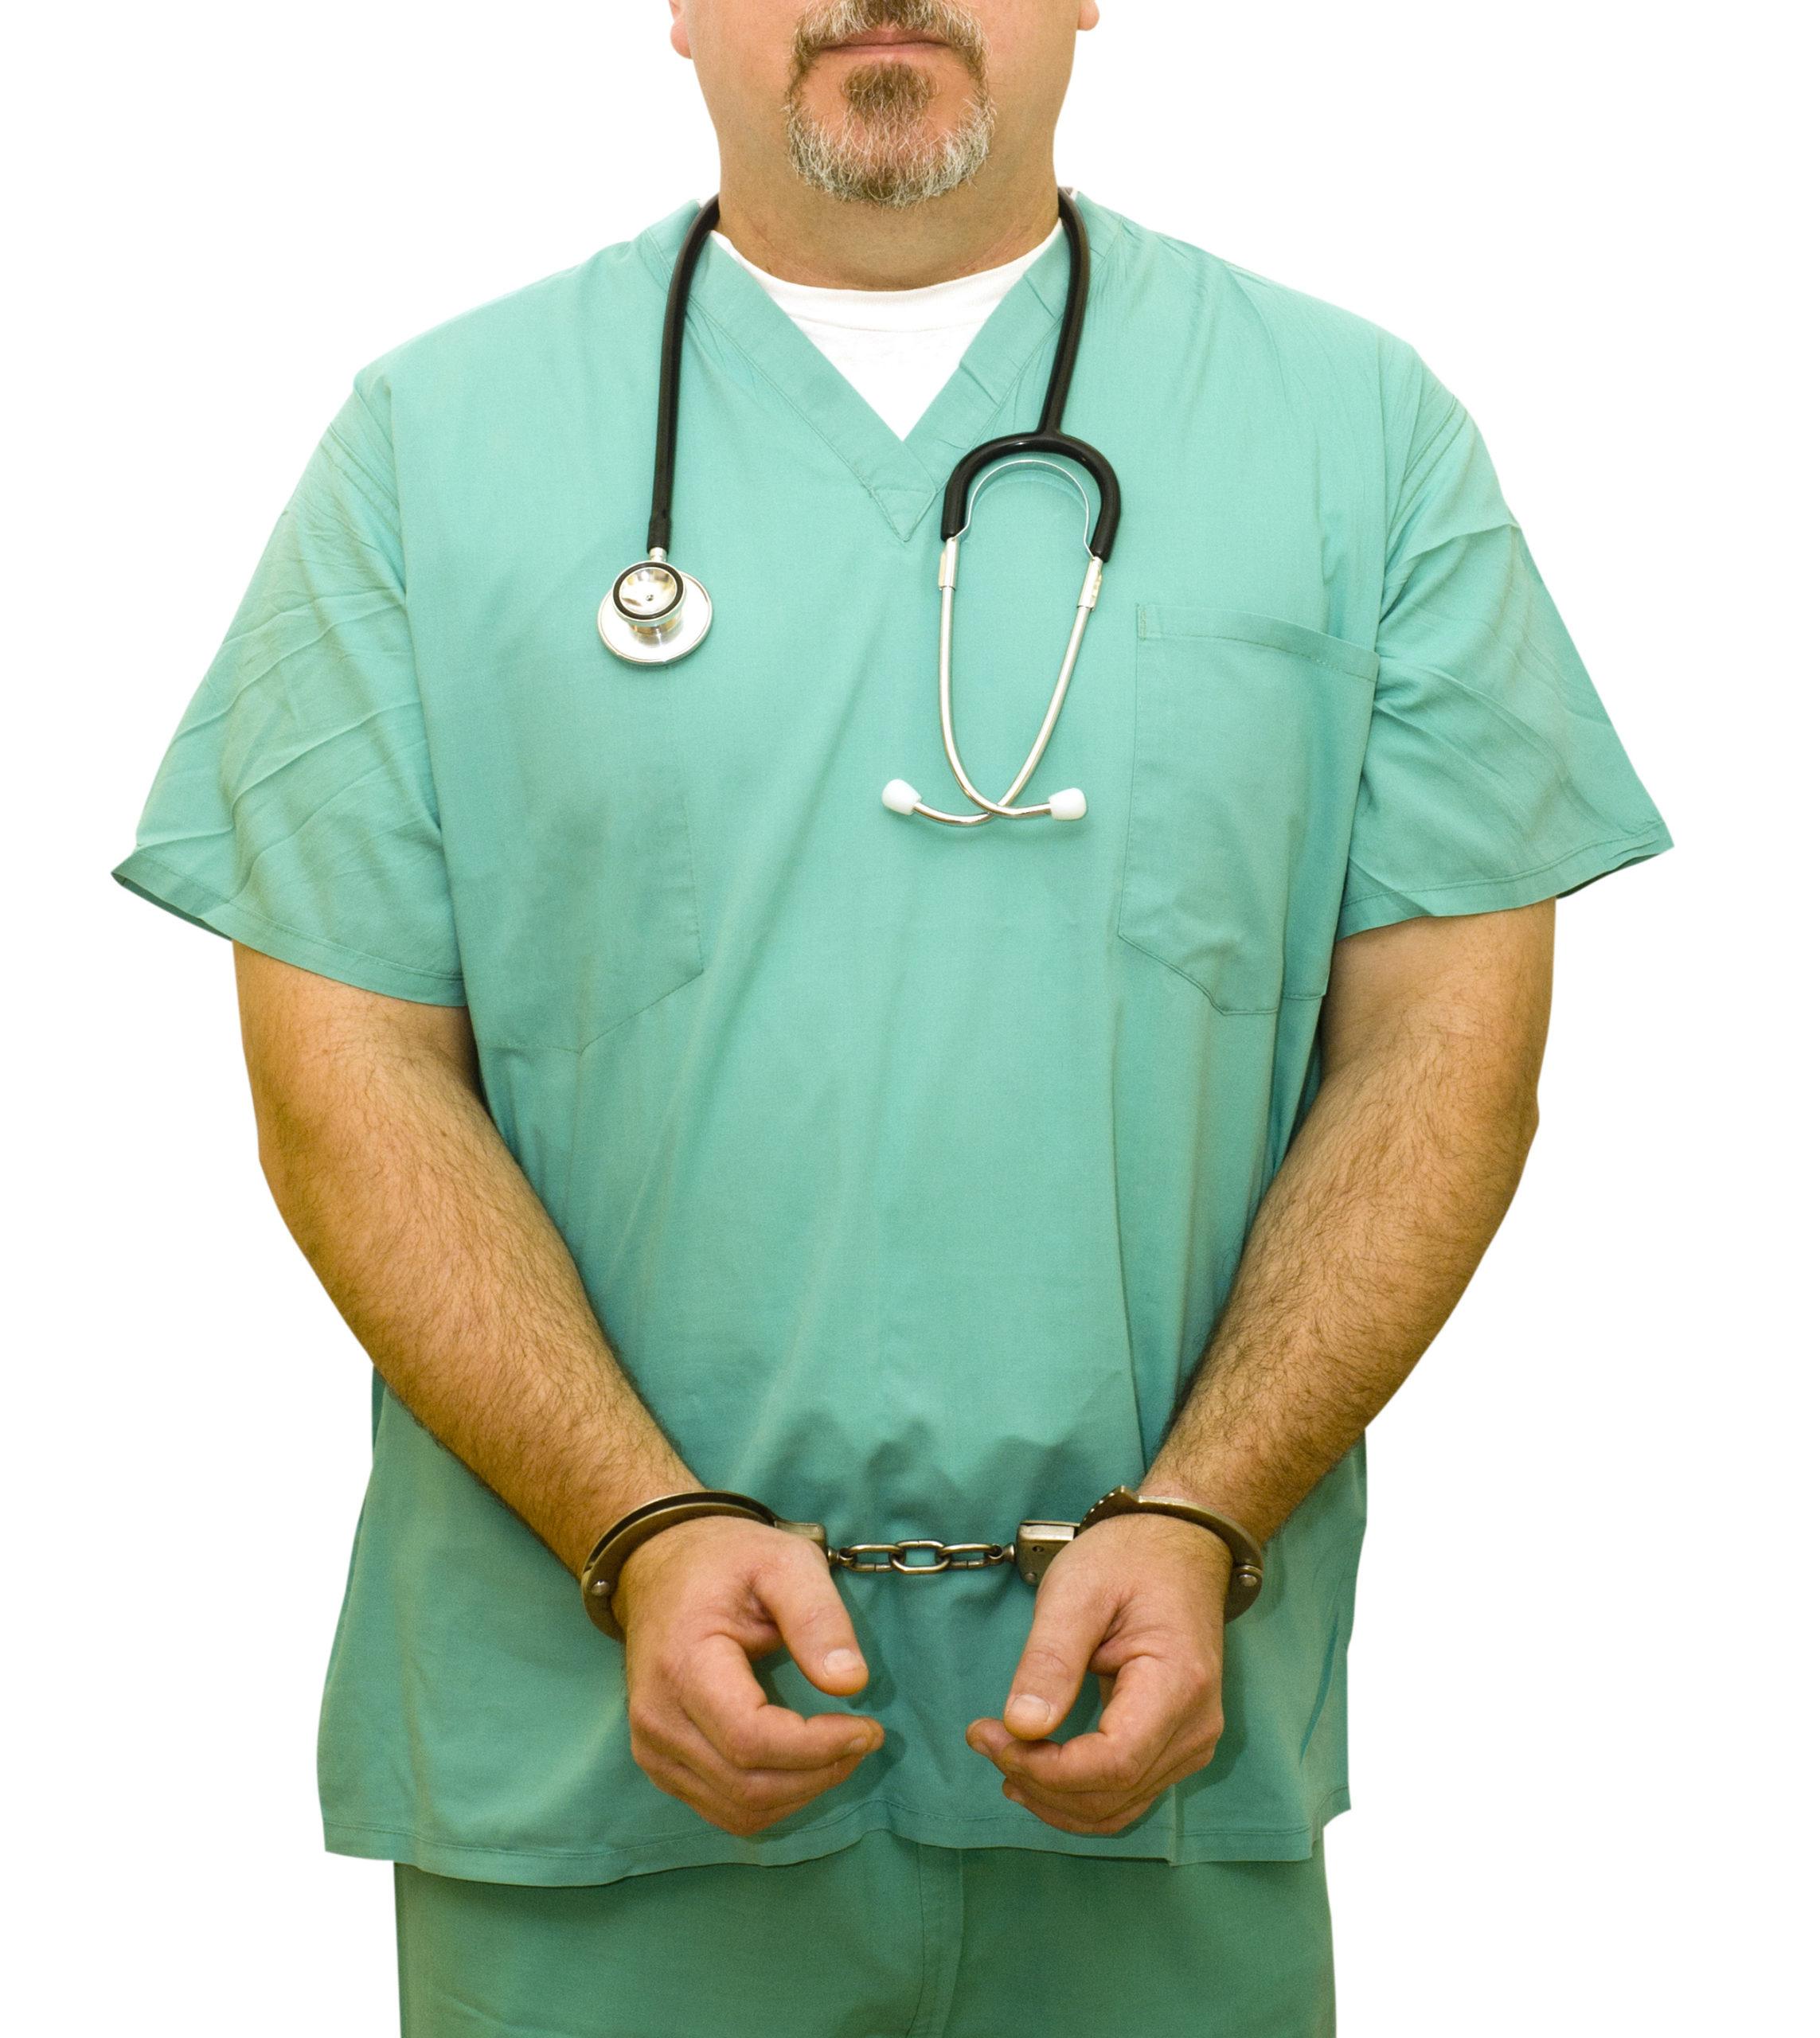 el cajon health care fraud